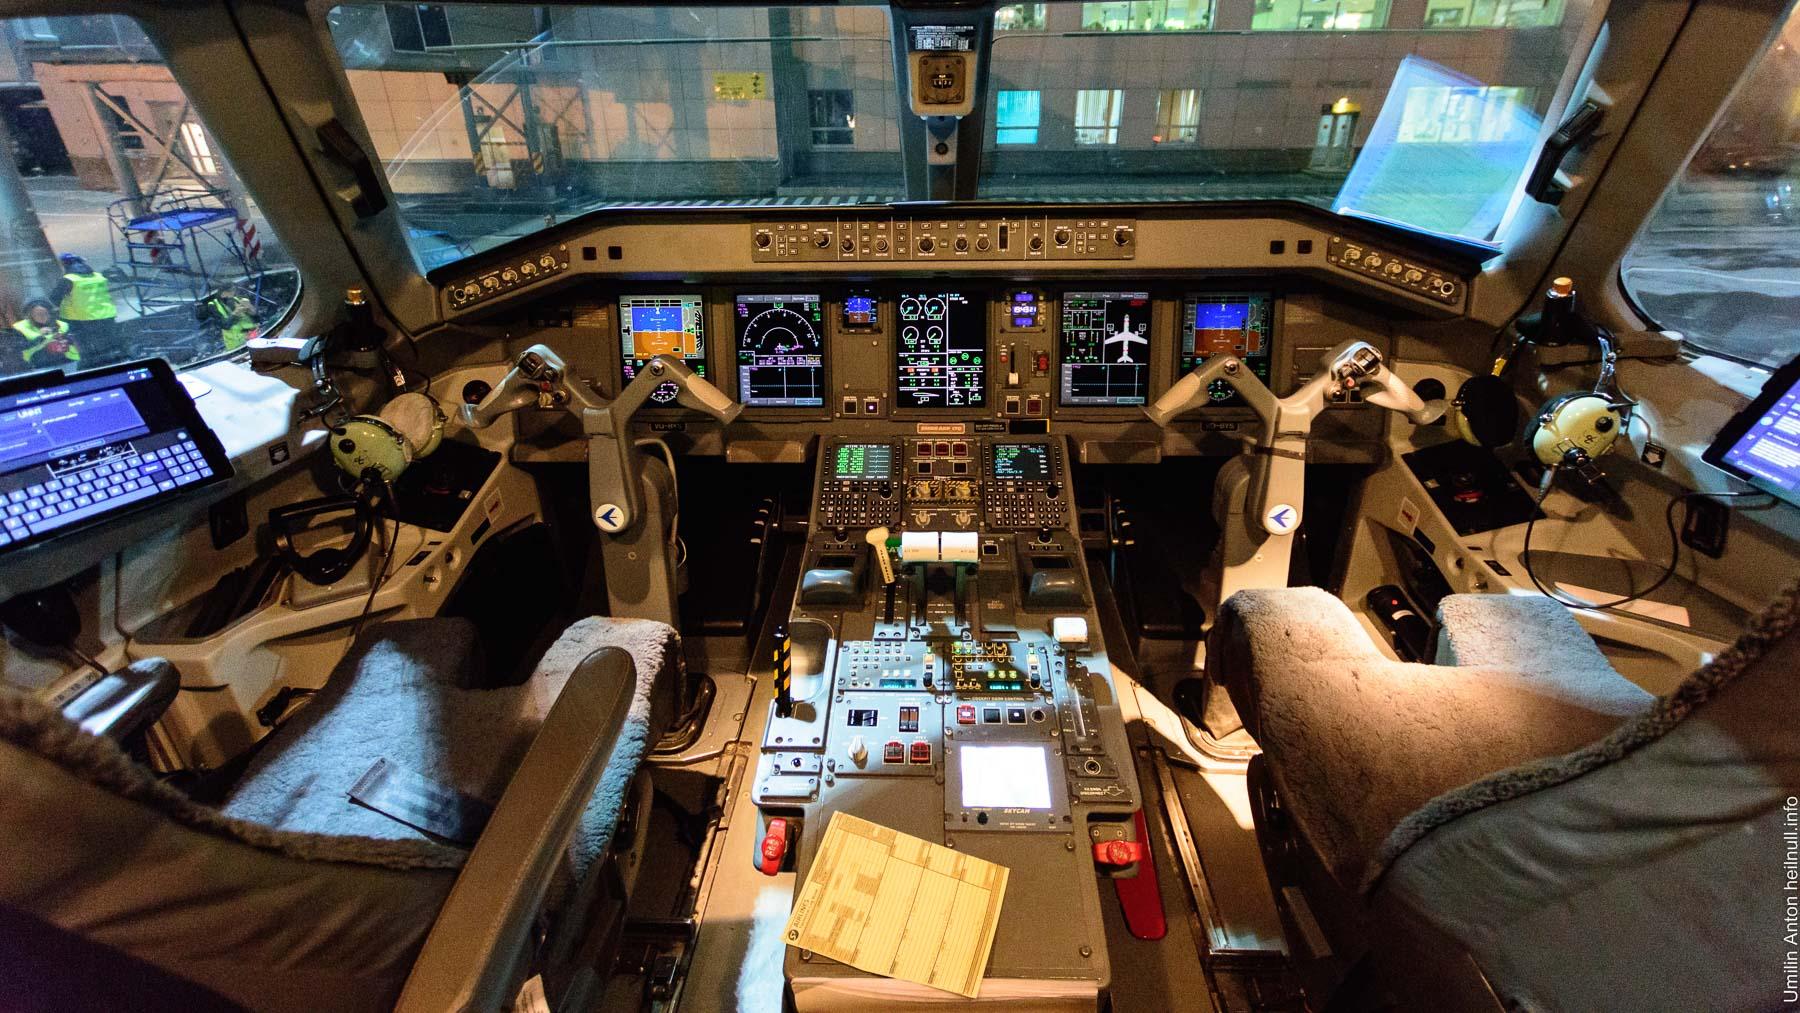 UAY_5233-25